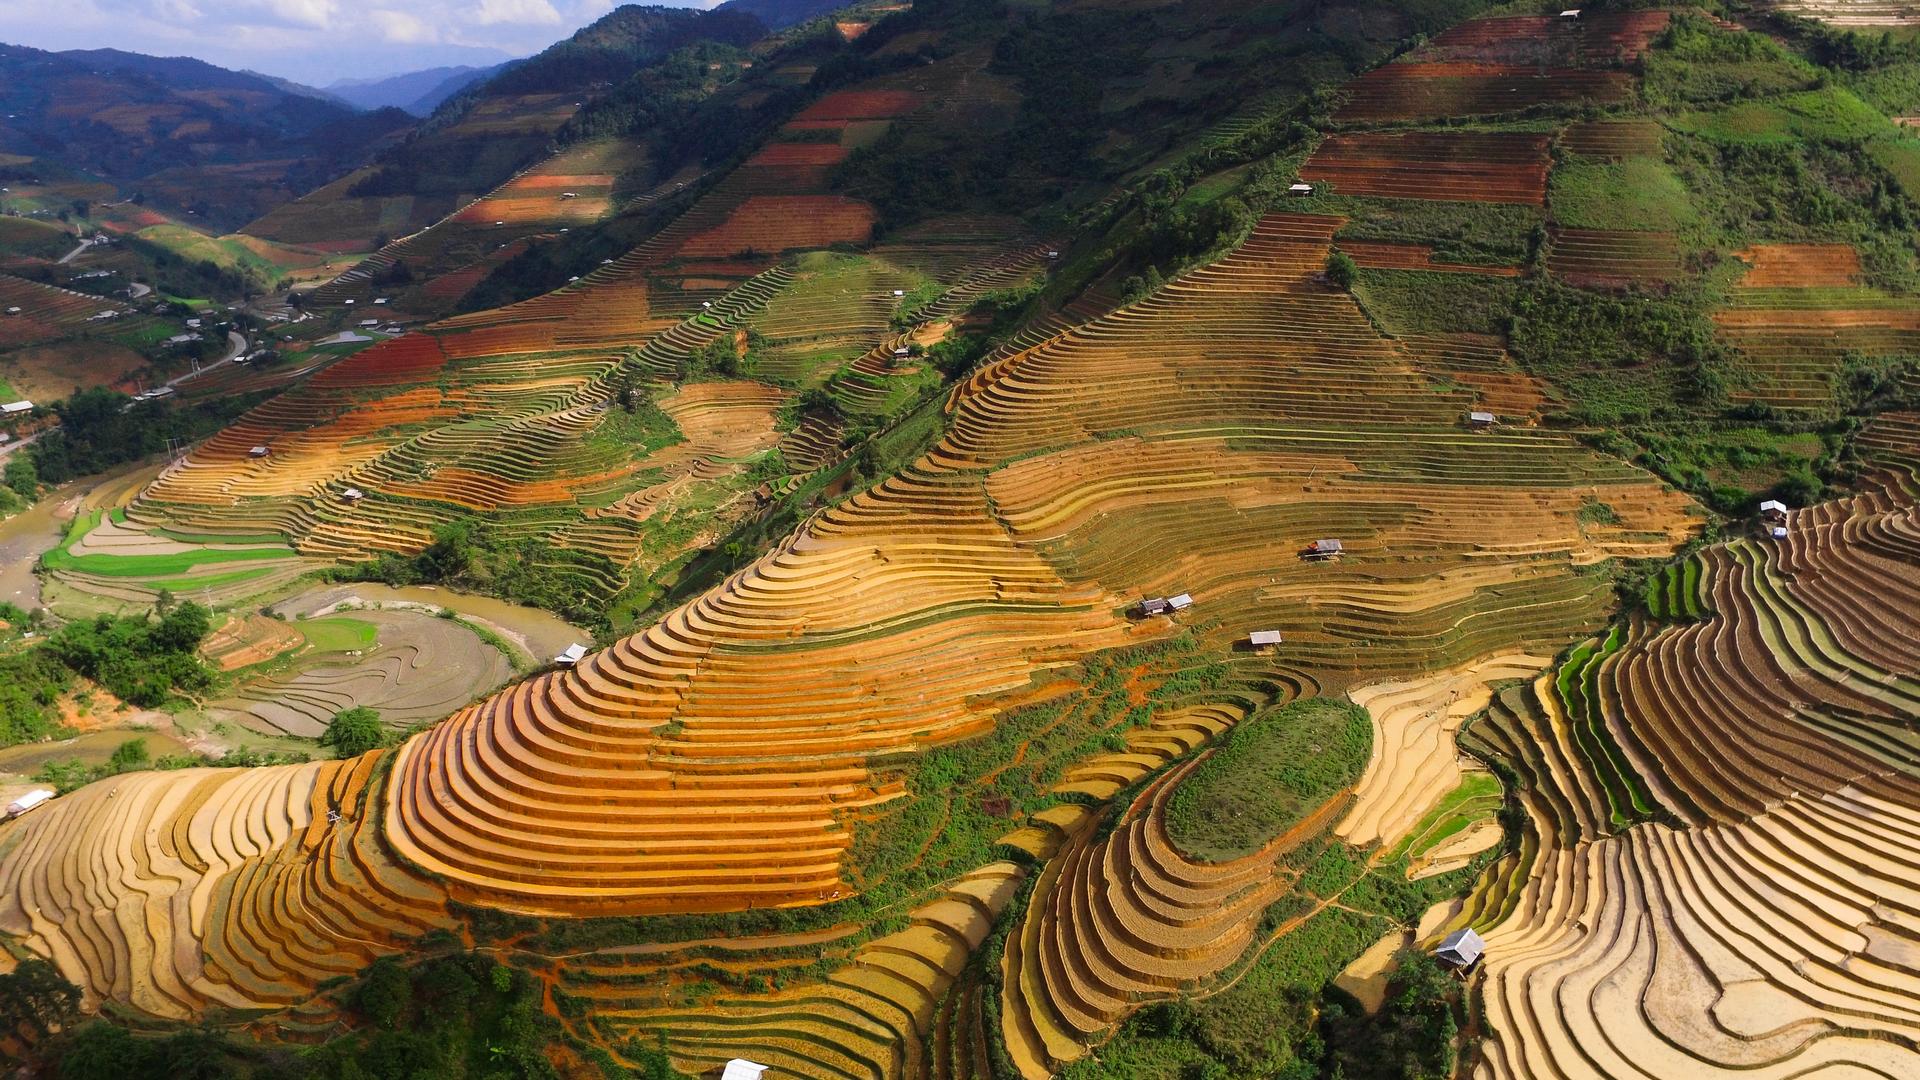 A view in Vietnam